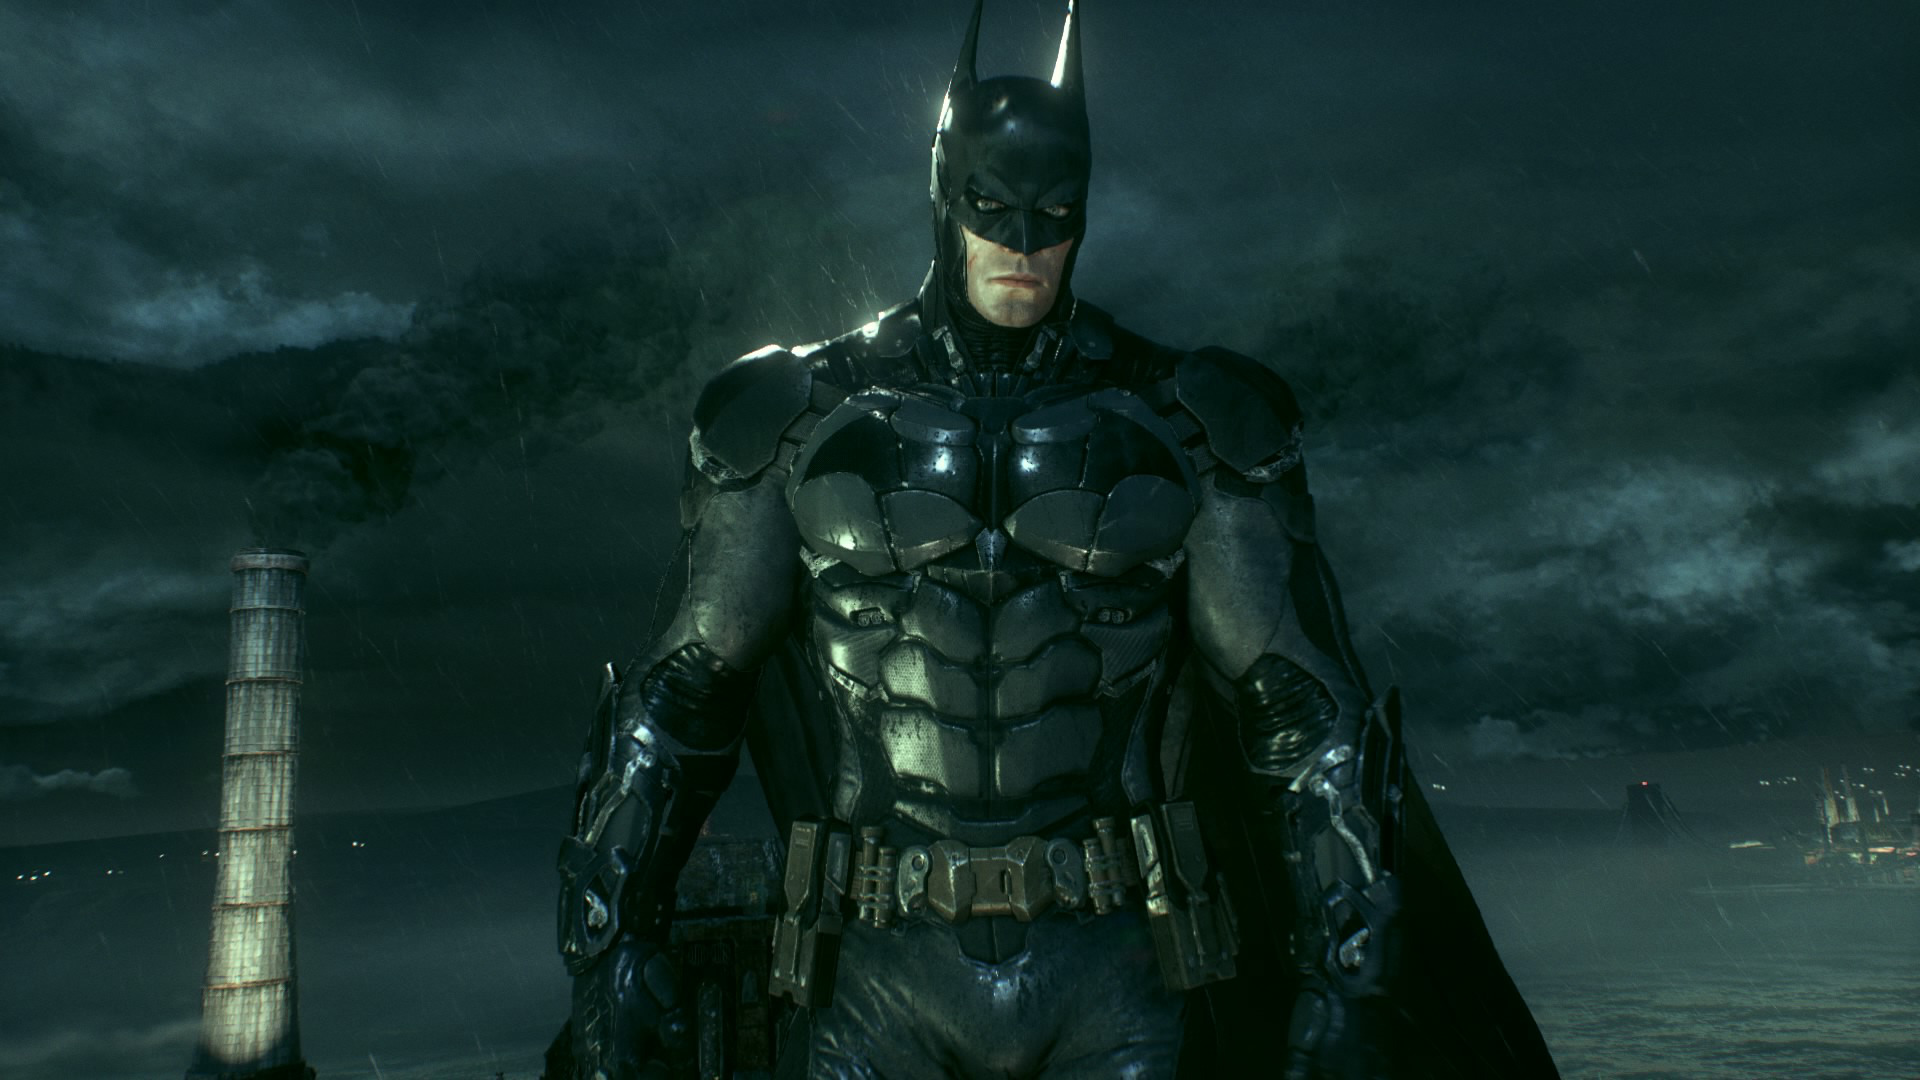 Batman: Arkham Knight Direct-Feed 1080p Screenshots Show ...